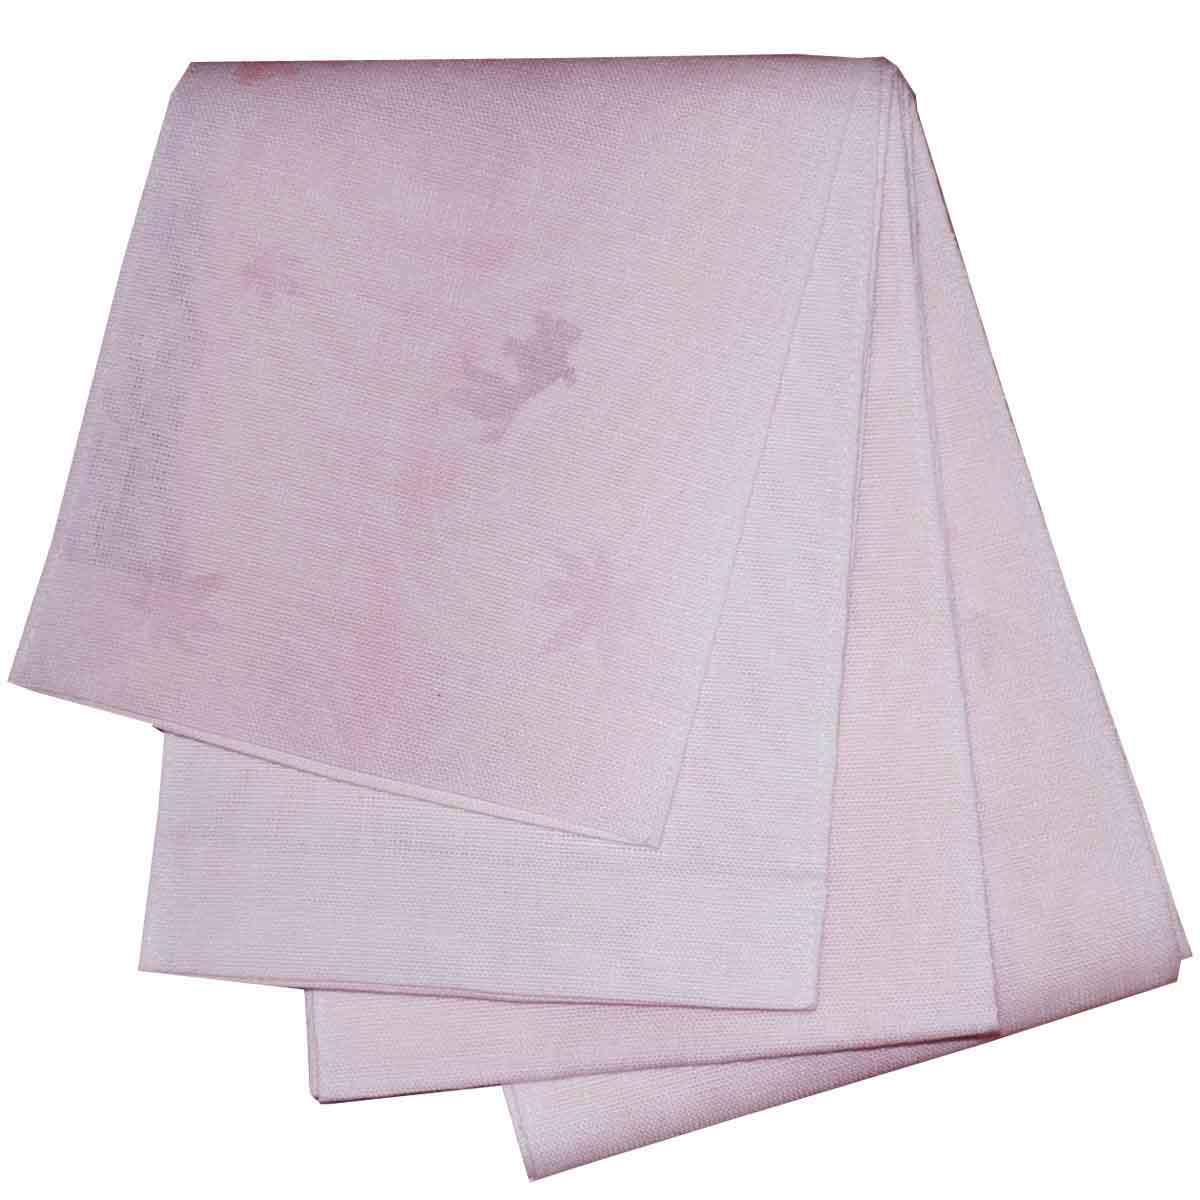 5%OFF クーポン 送料無料 日本製 本麻ボカシ 浴衣帯 半幅帯 半幅帯 小袋帯 金魚柄 ピンク 出店10周年記念